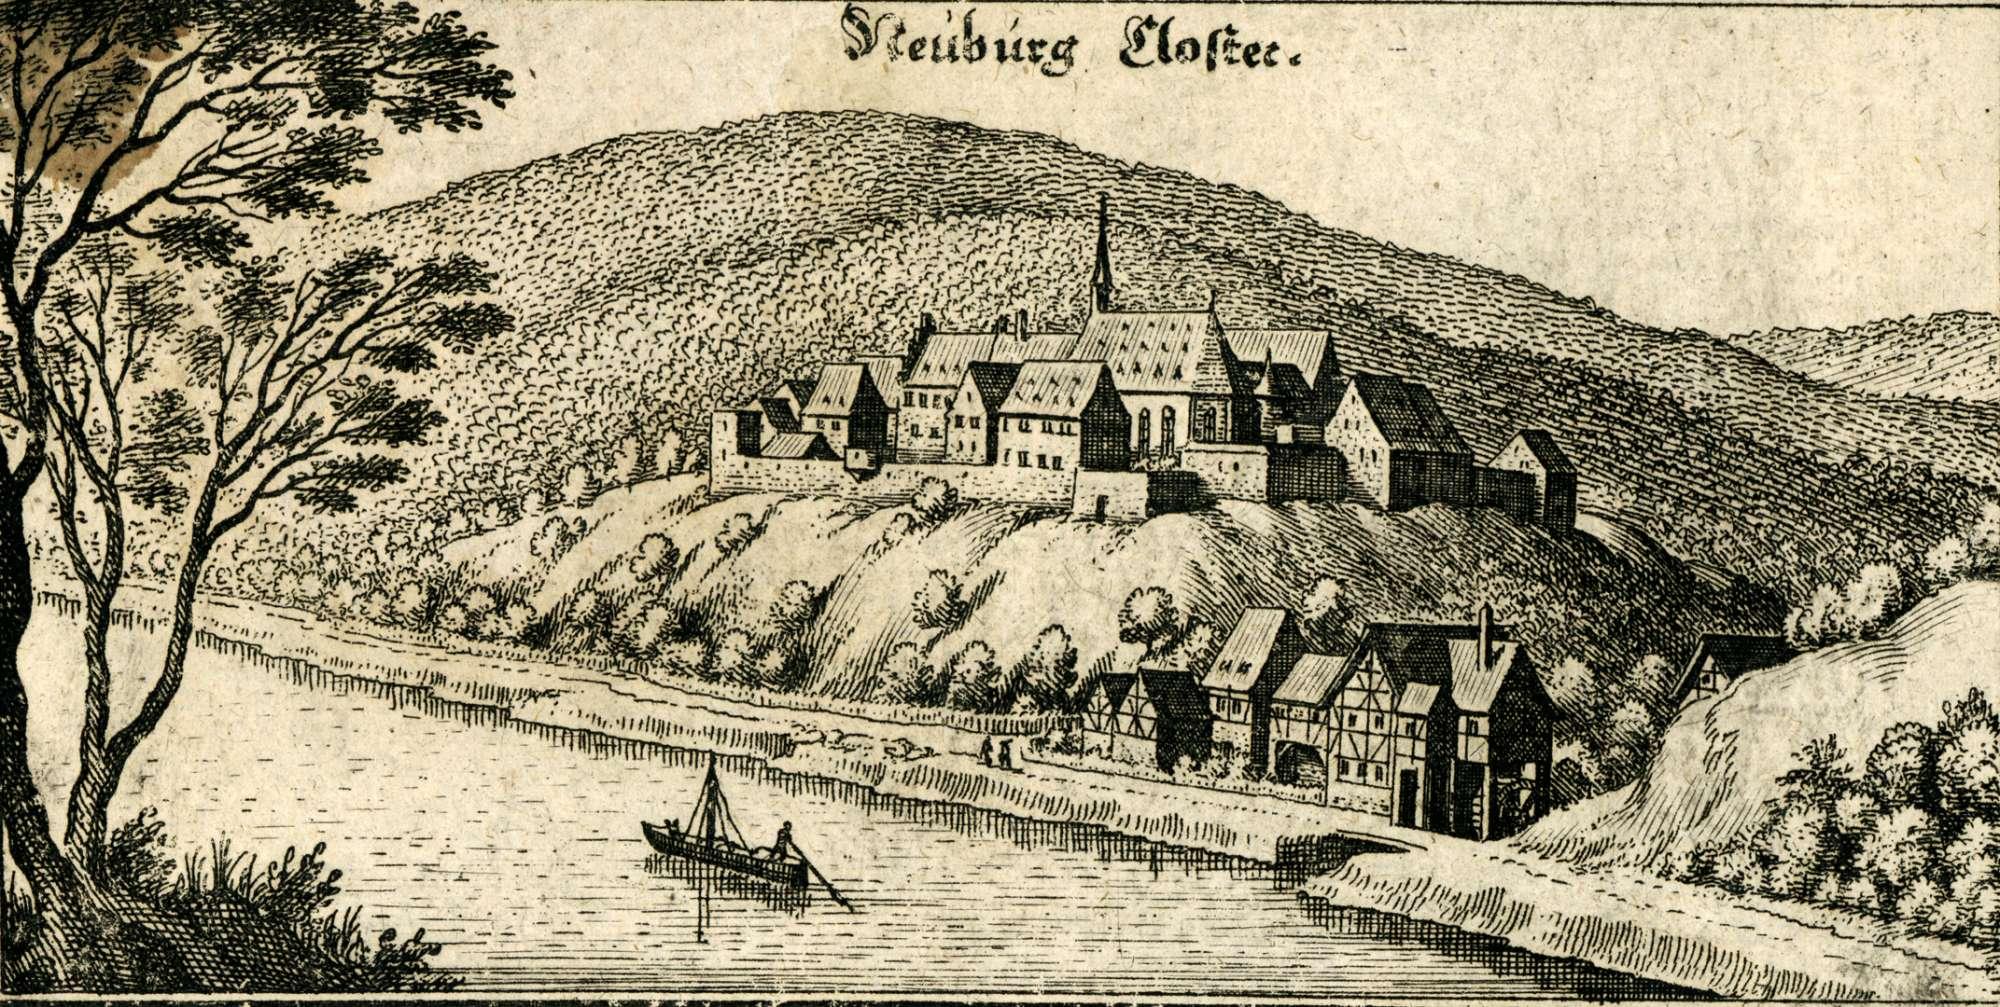 Neuburg Closter, Bild 1